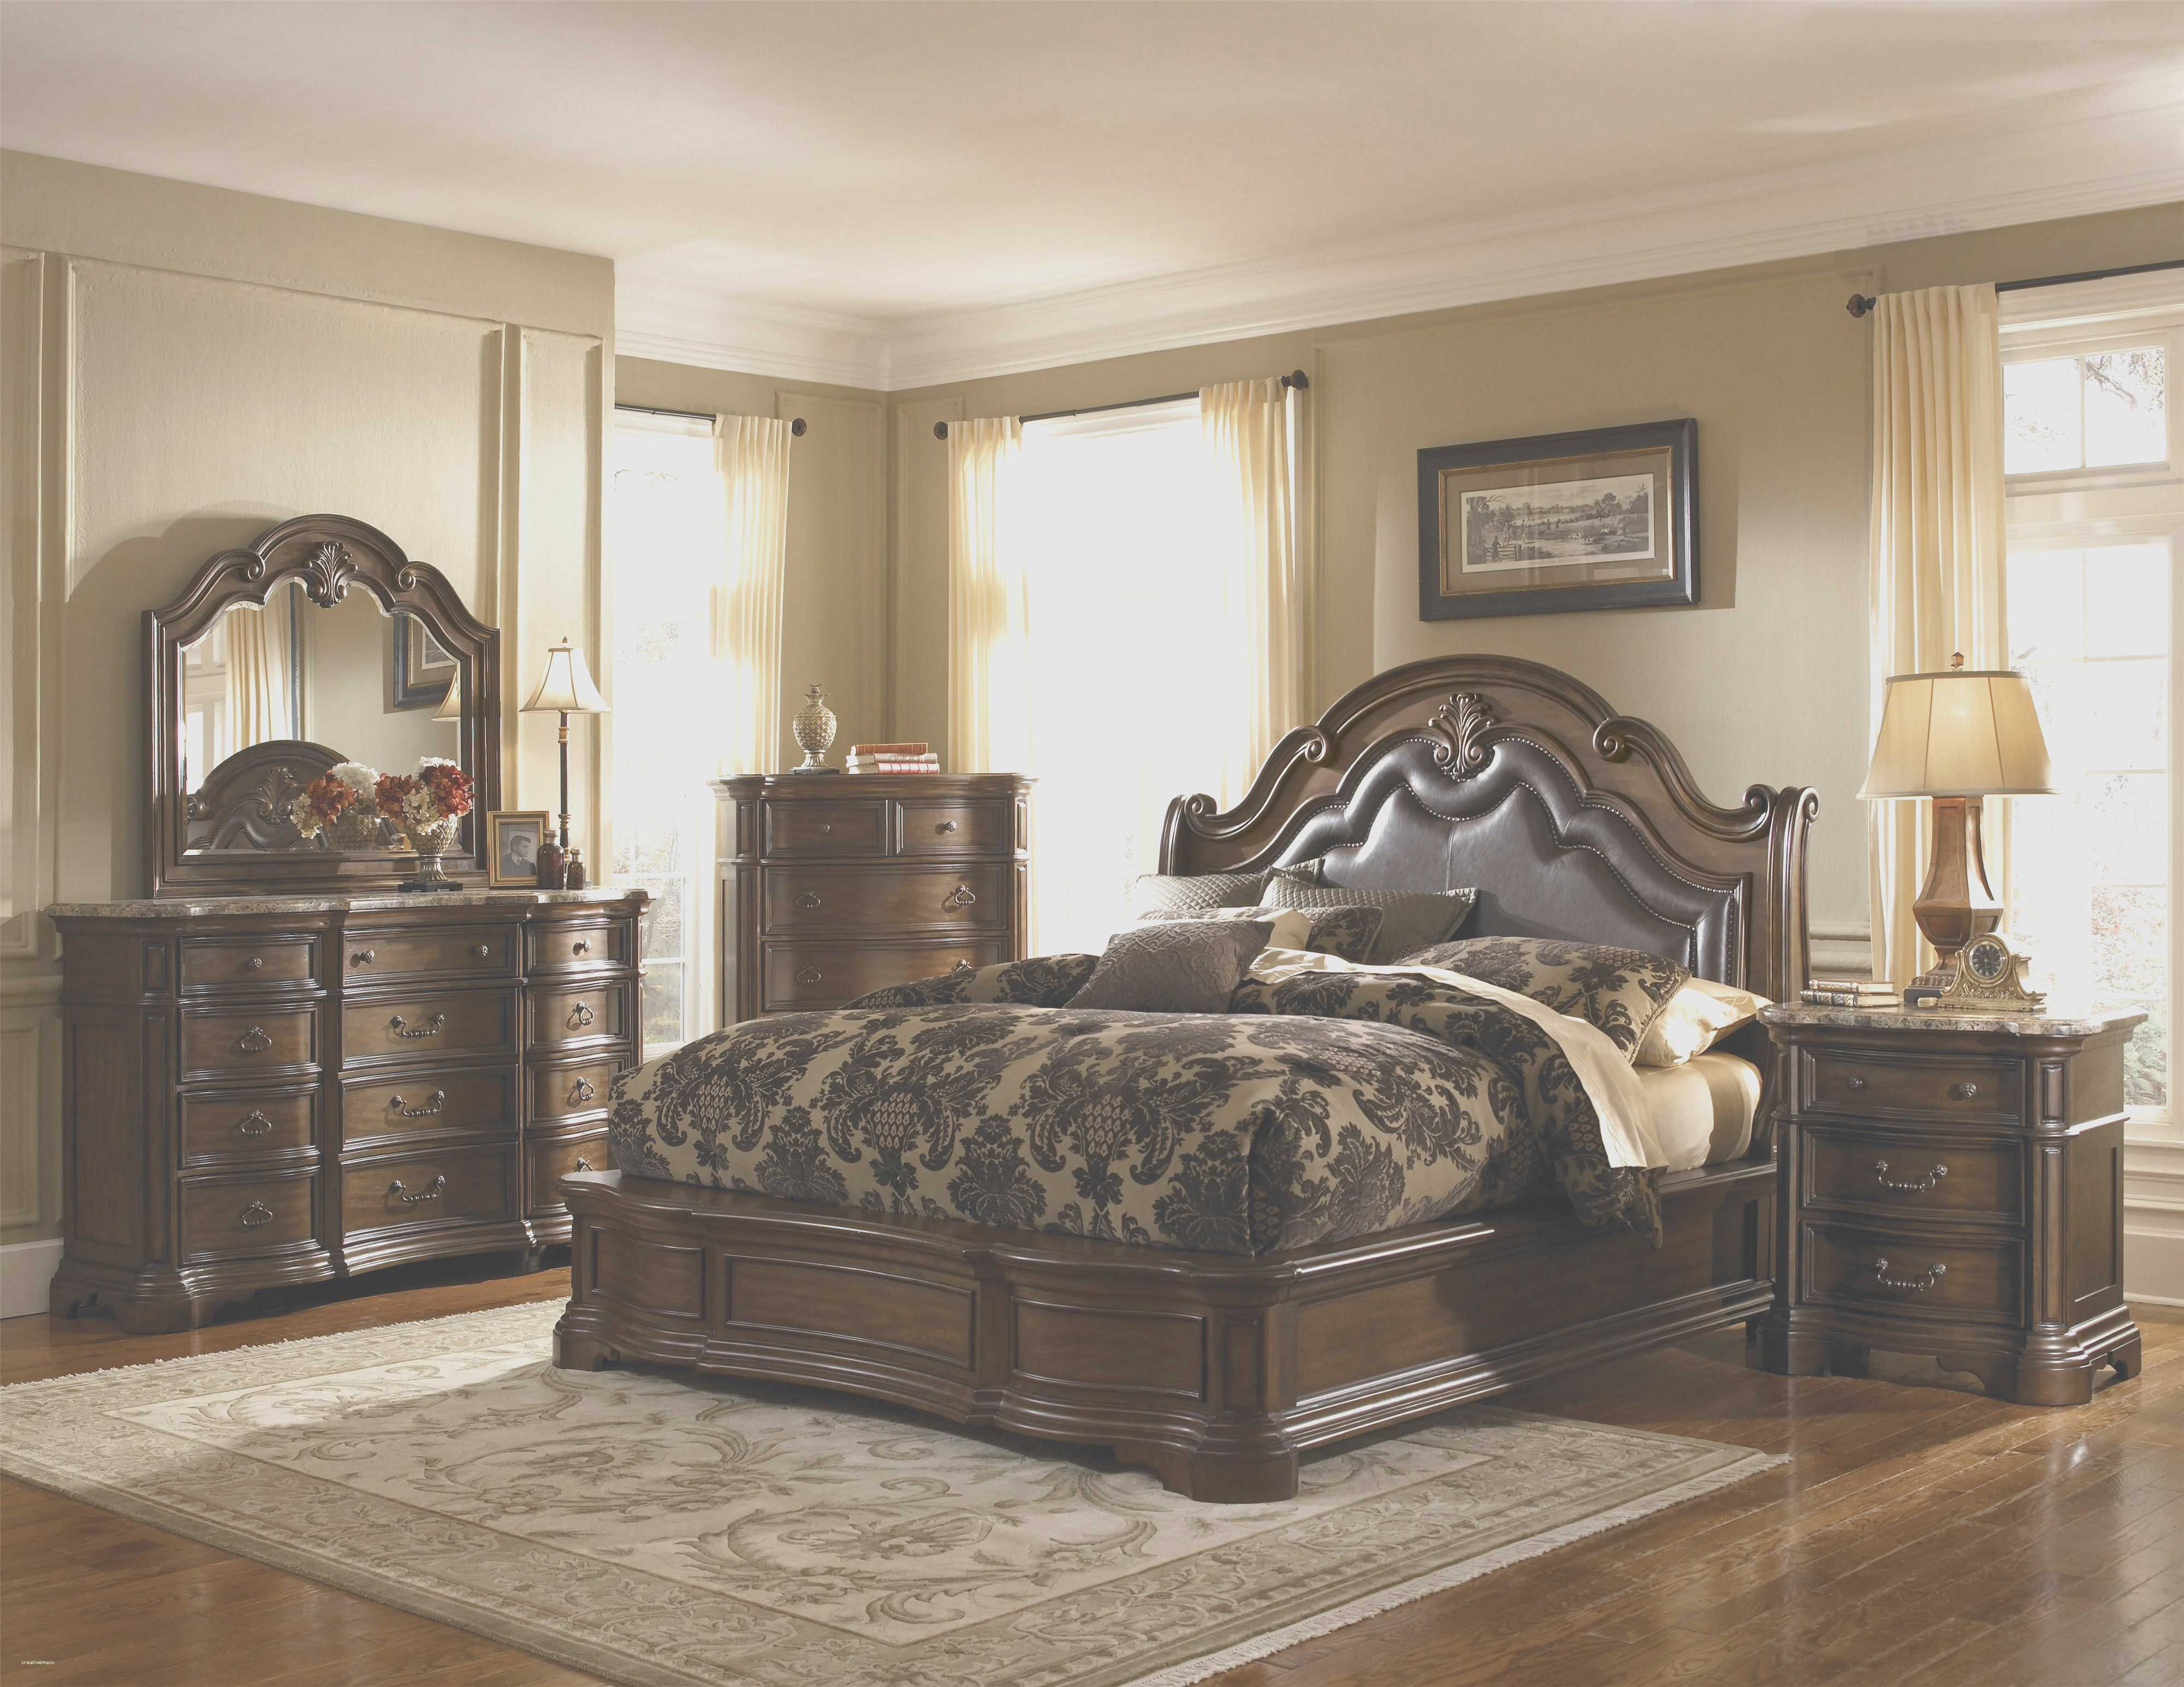 traditional designer bedroom furniture photo - 3